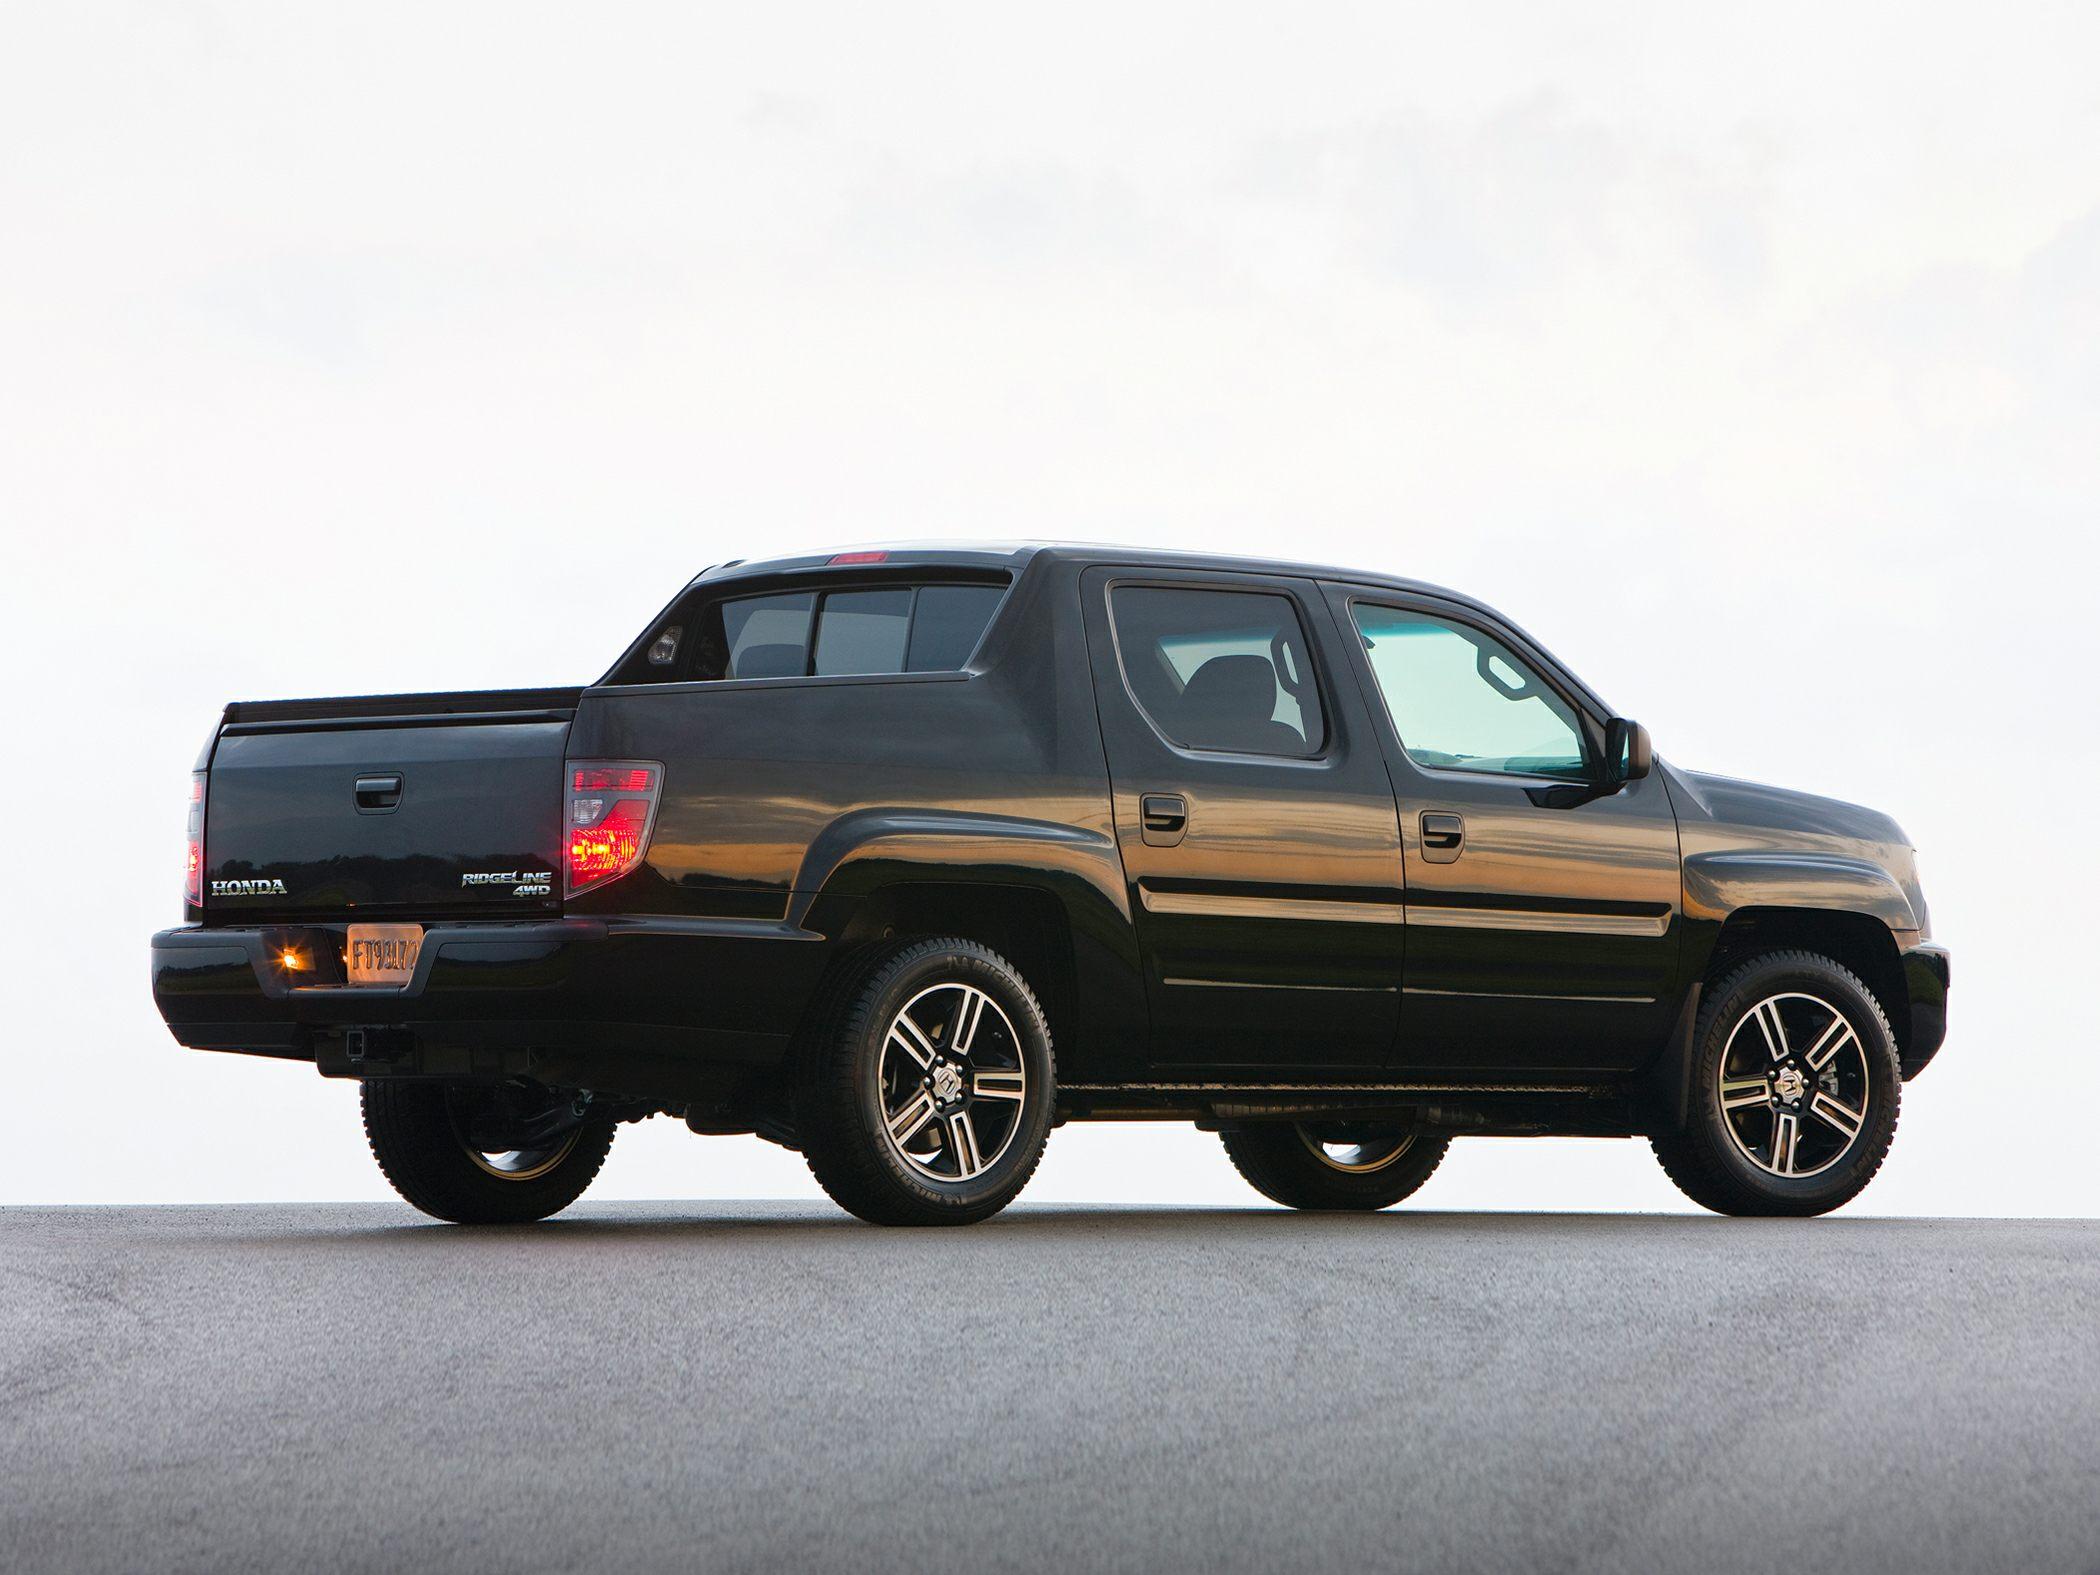 2014 Honda Ridgeline Glam2